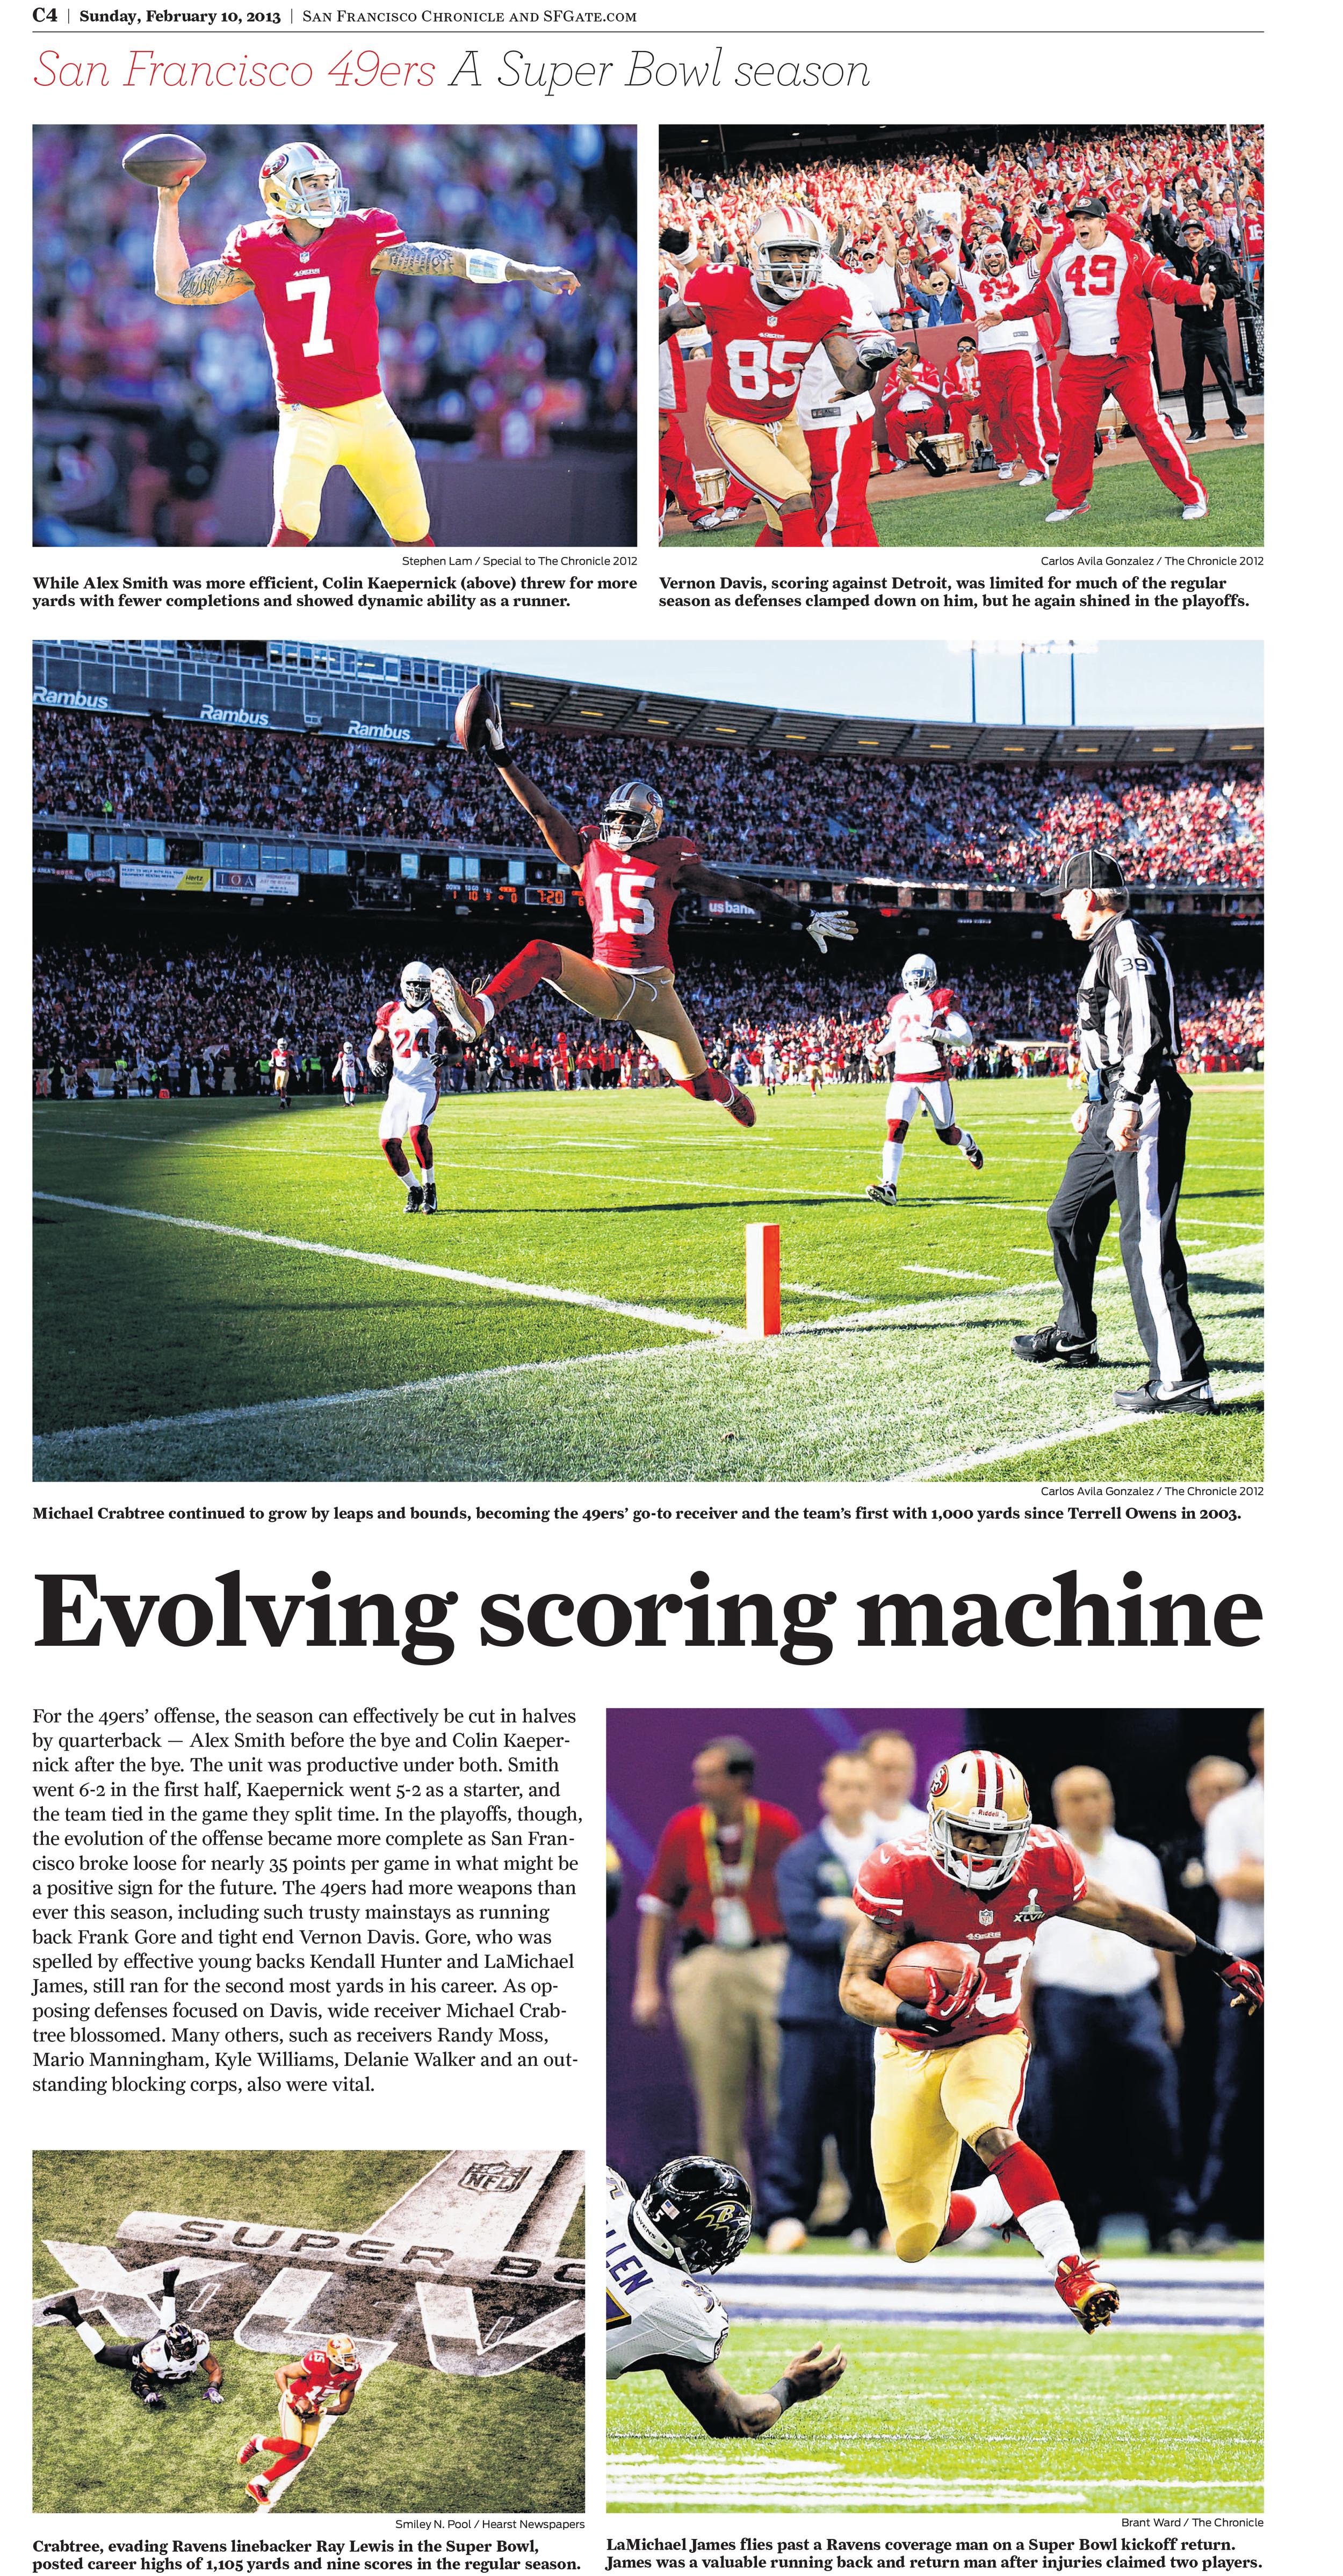 The San Francisco Chronicle and SFGate.com February 10, 2013 © San Francisco Chronicle